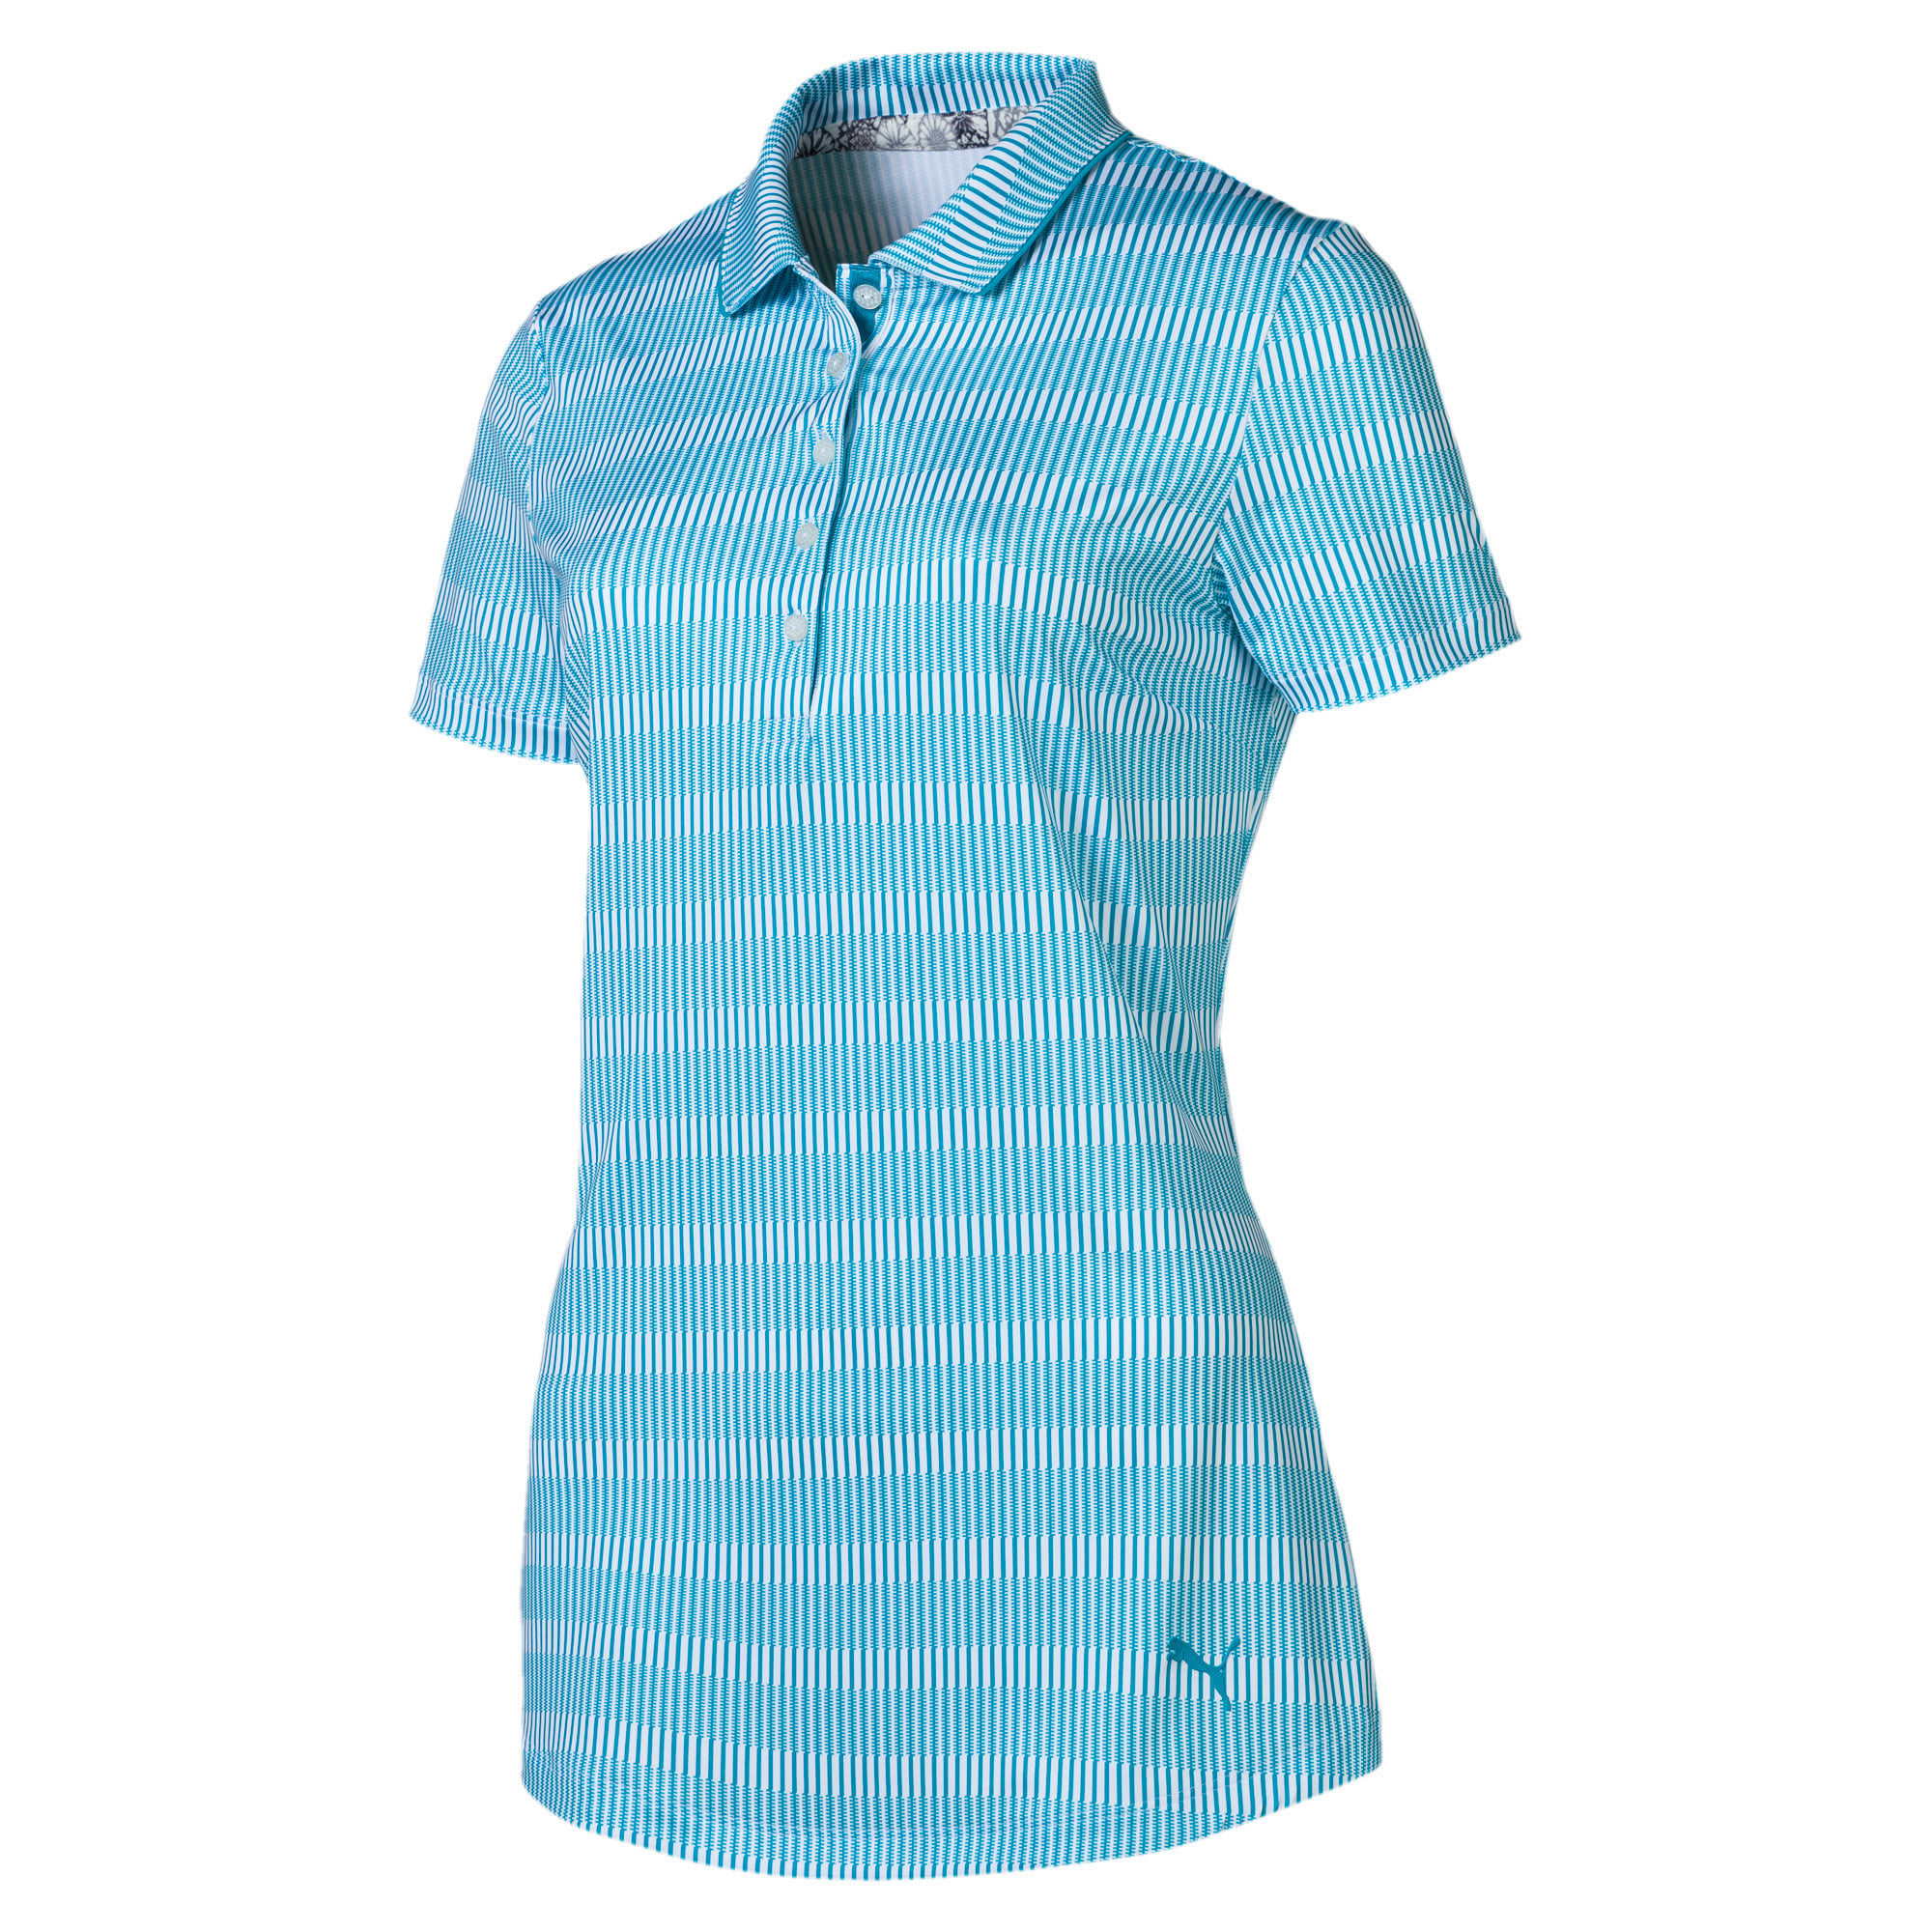 Thumbnail 1 of Forward Tees Women's Golf Polo, Caribbean Sea, medium